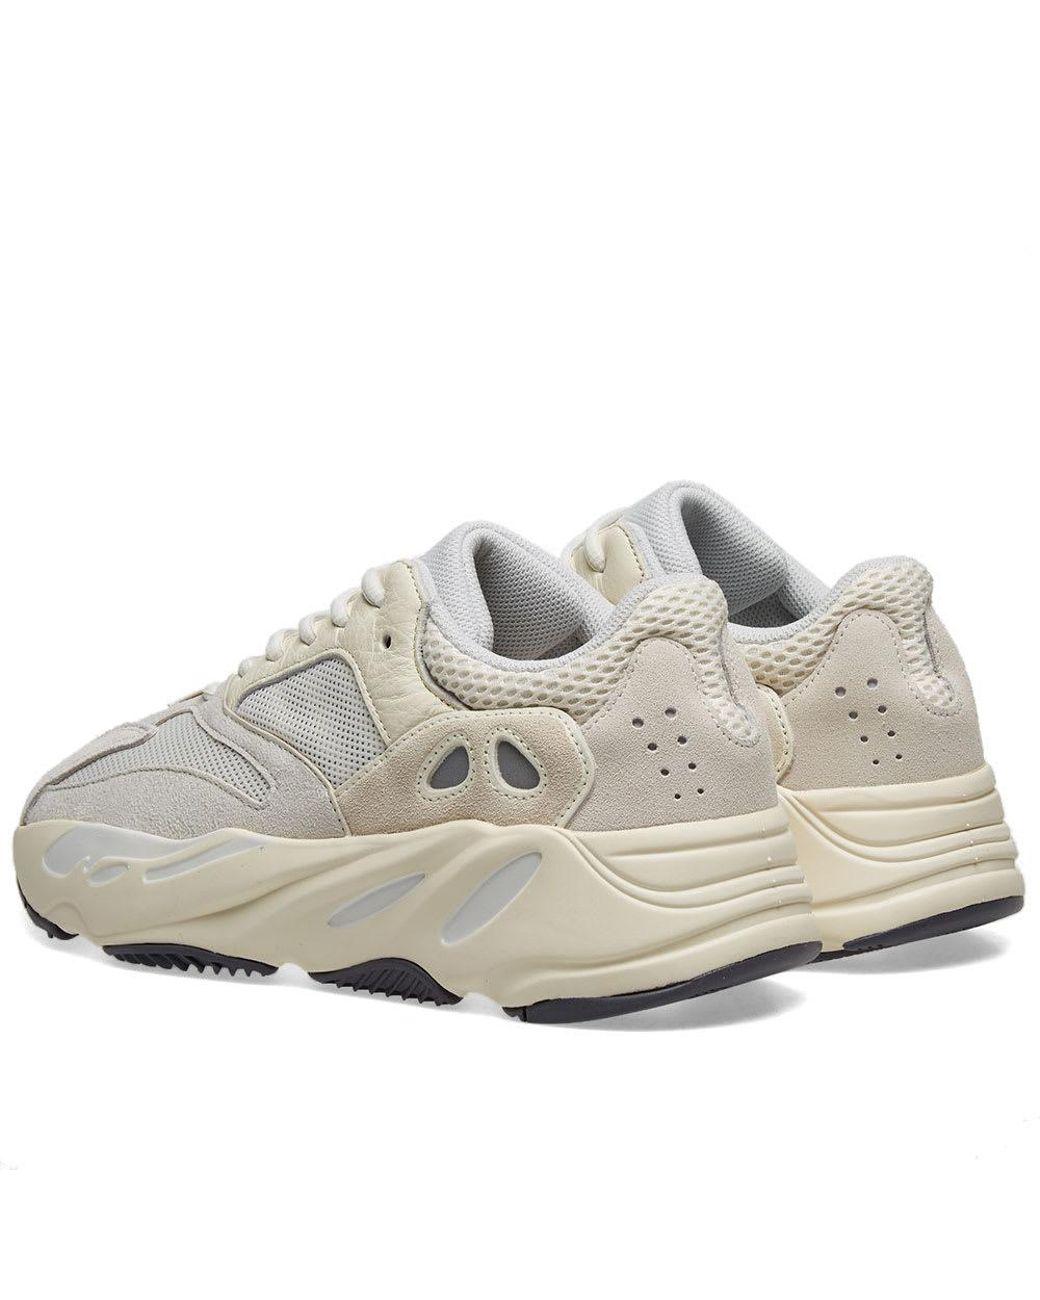 007605e737da0 Lyst - adidas Yeezy Boost 700 in White for Men